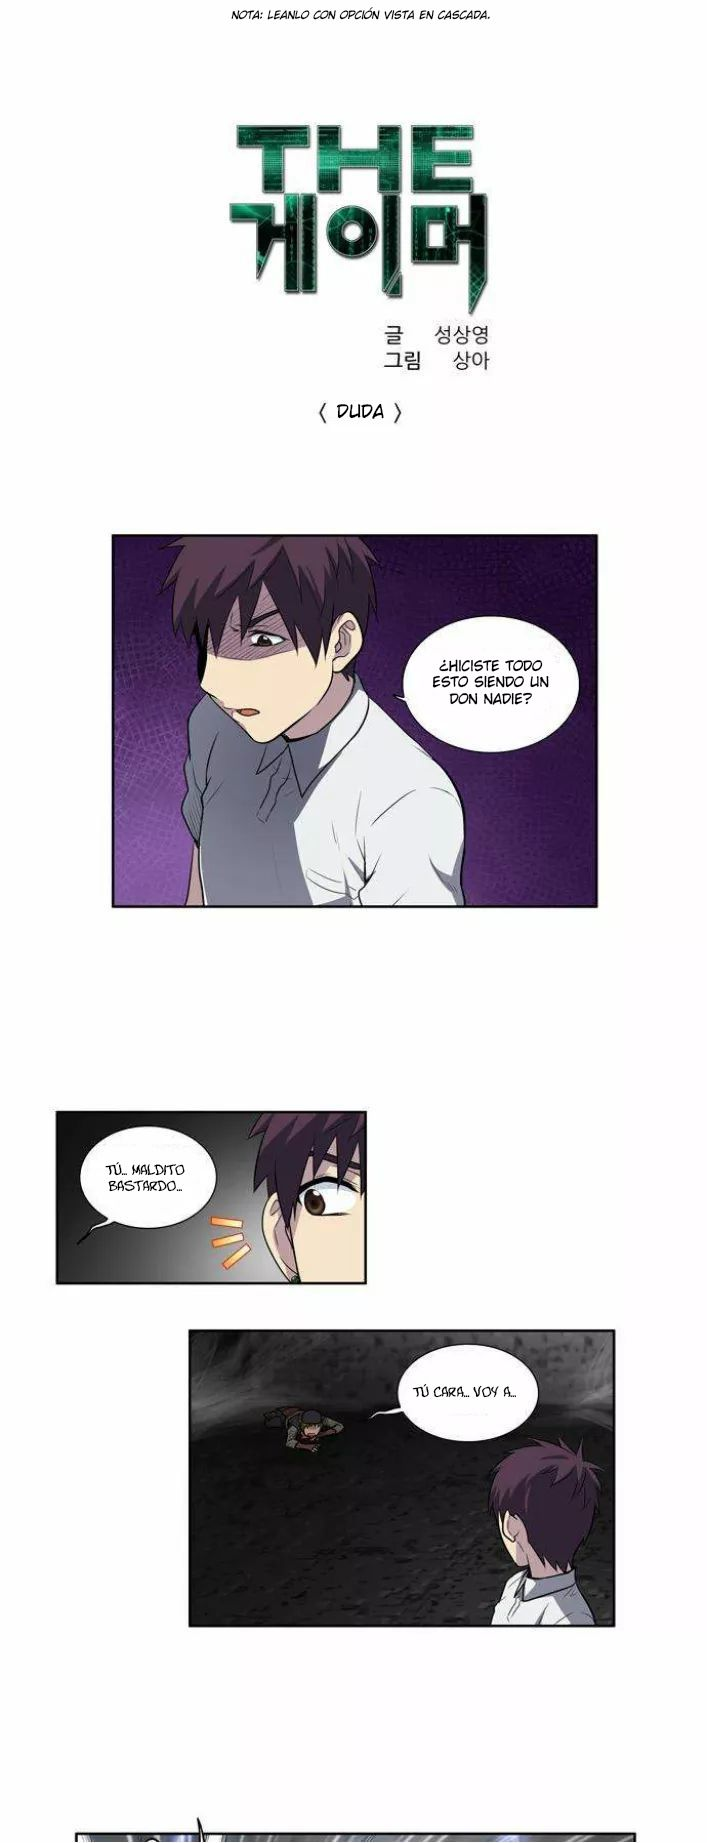 http://c5.ninemanga.com/es_manga/61/1725/484924/44ae89d55000adae176d4454023c237c.jpg Page 2